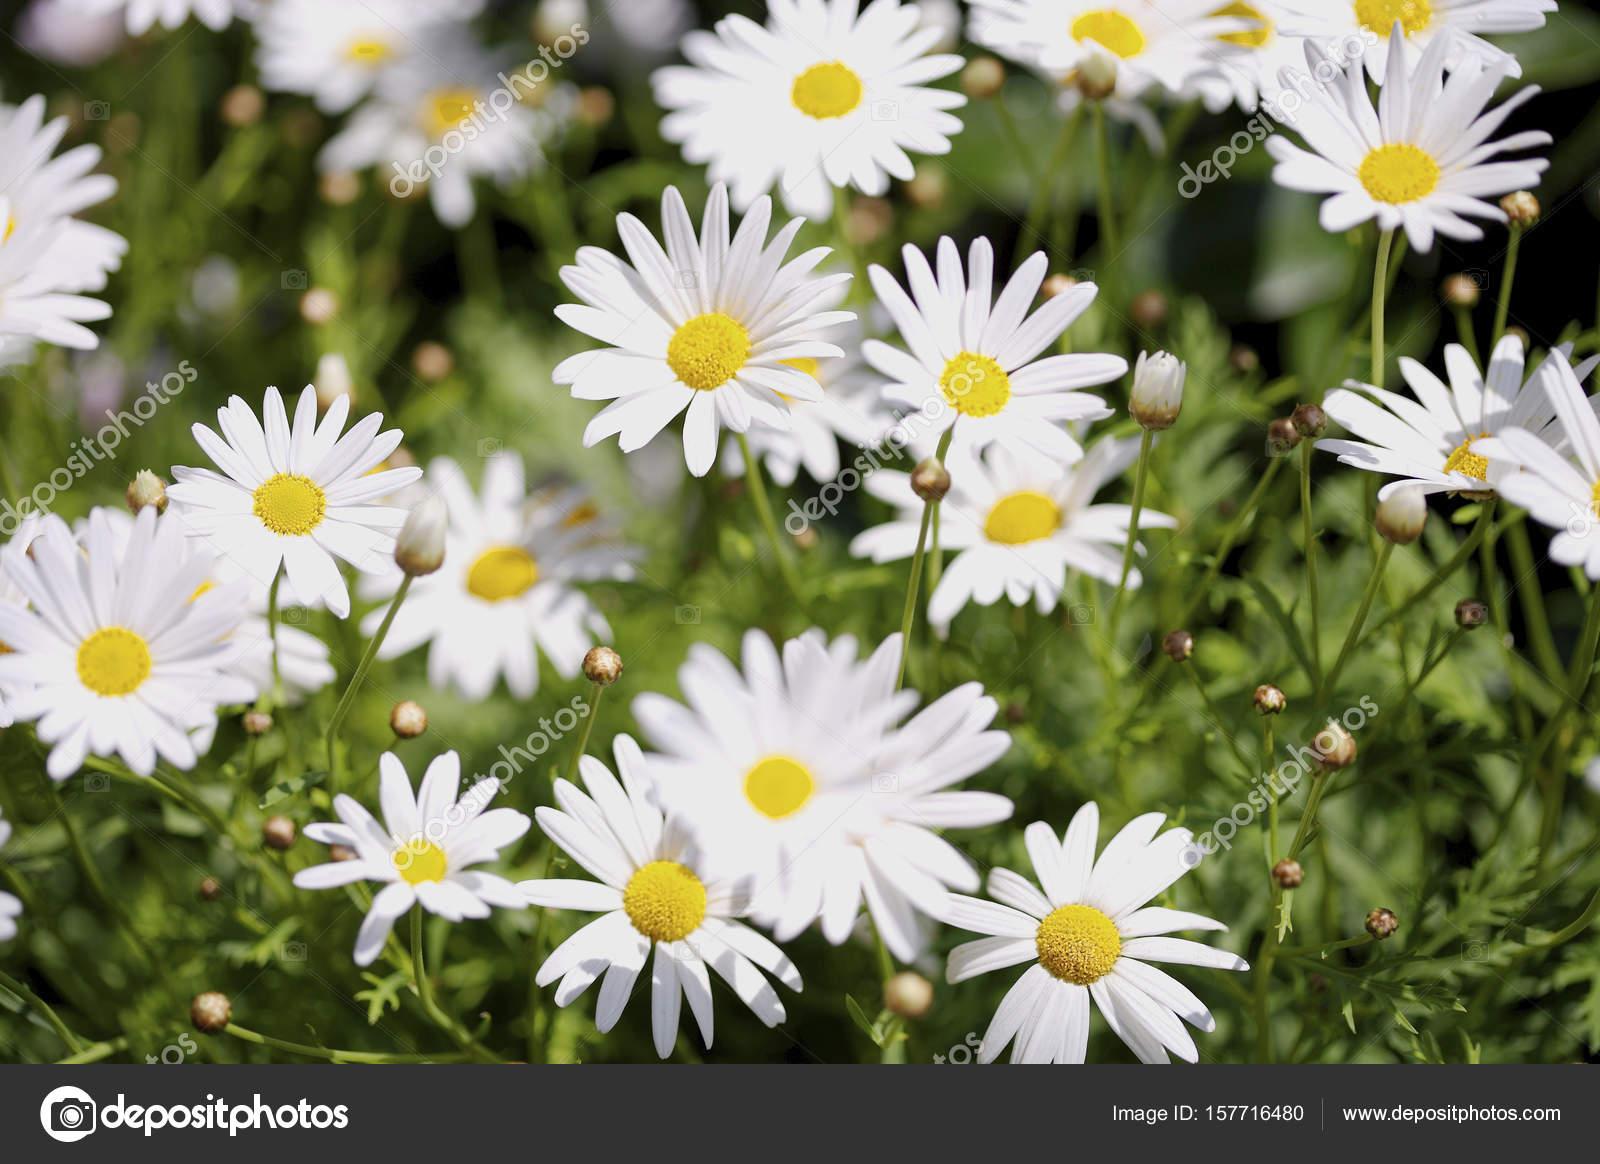 Beautiful daisy flowers stock photo topphoto 157716480 beautiful daisy flowers close up photo by topphoto izmirmasajfo